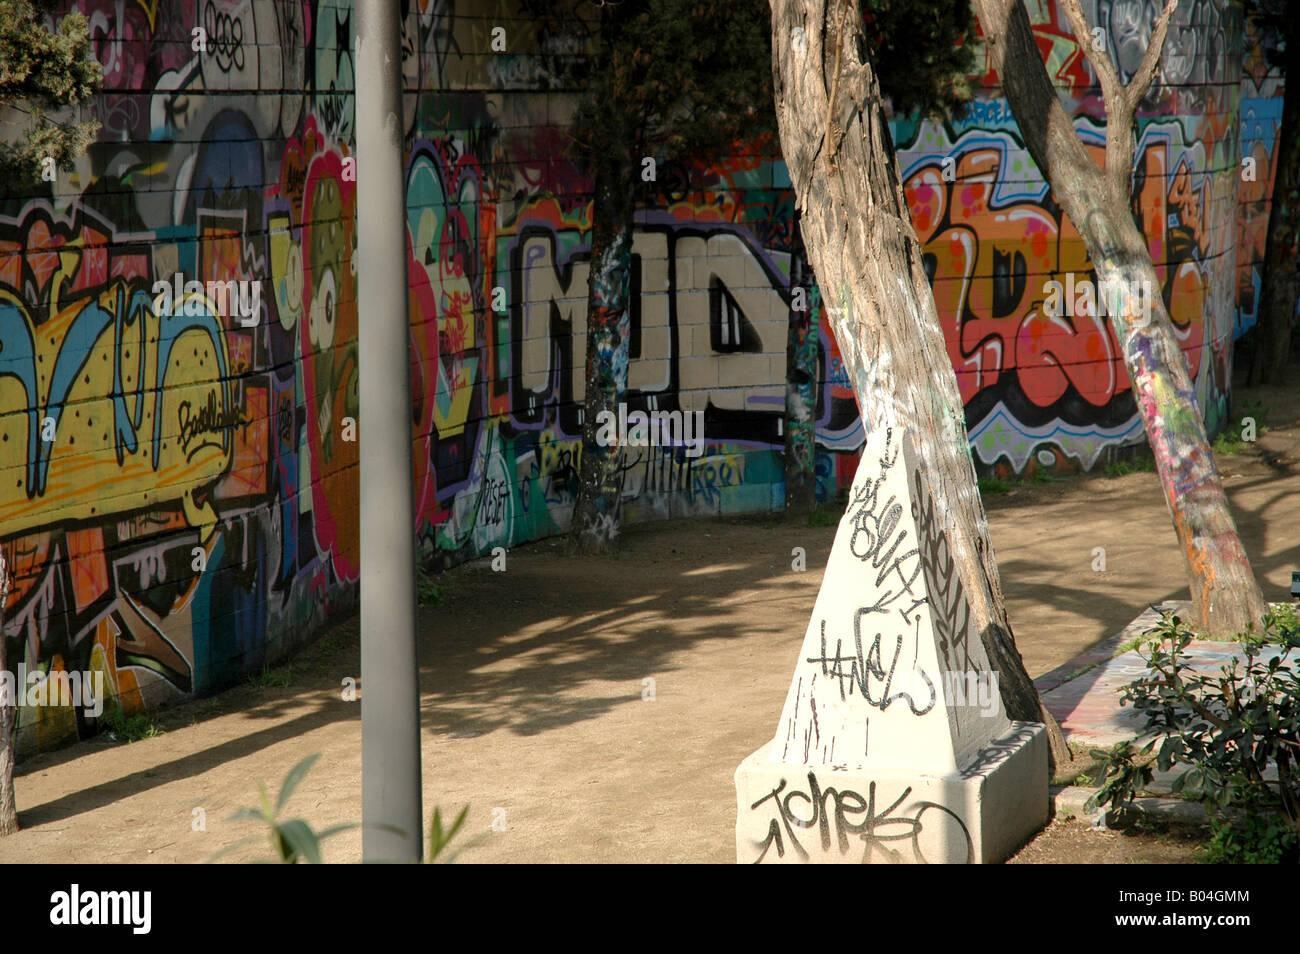 Tageslicht daylight sonnig sunny sunshiny Graffiti graffiti - Stock Image